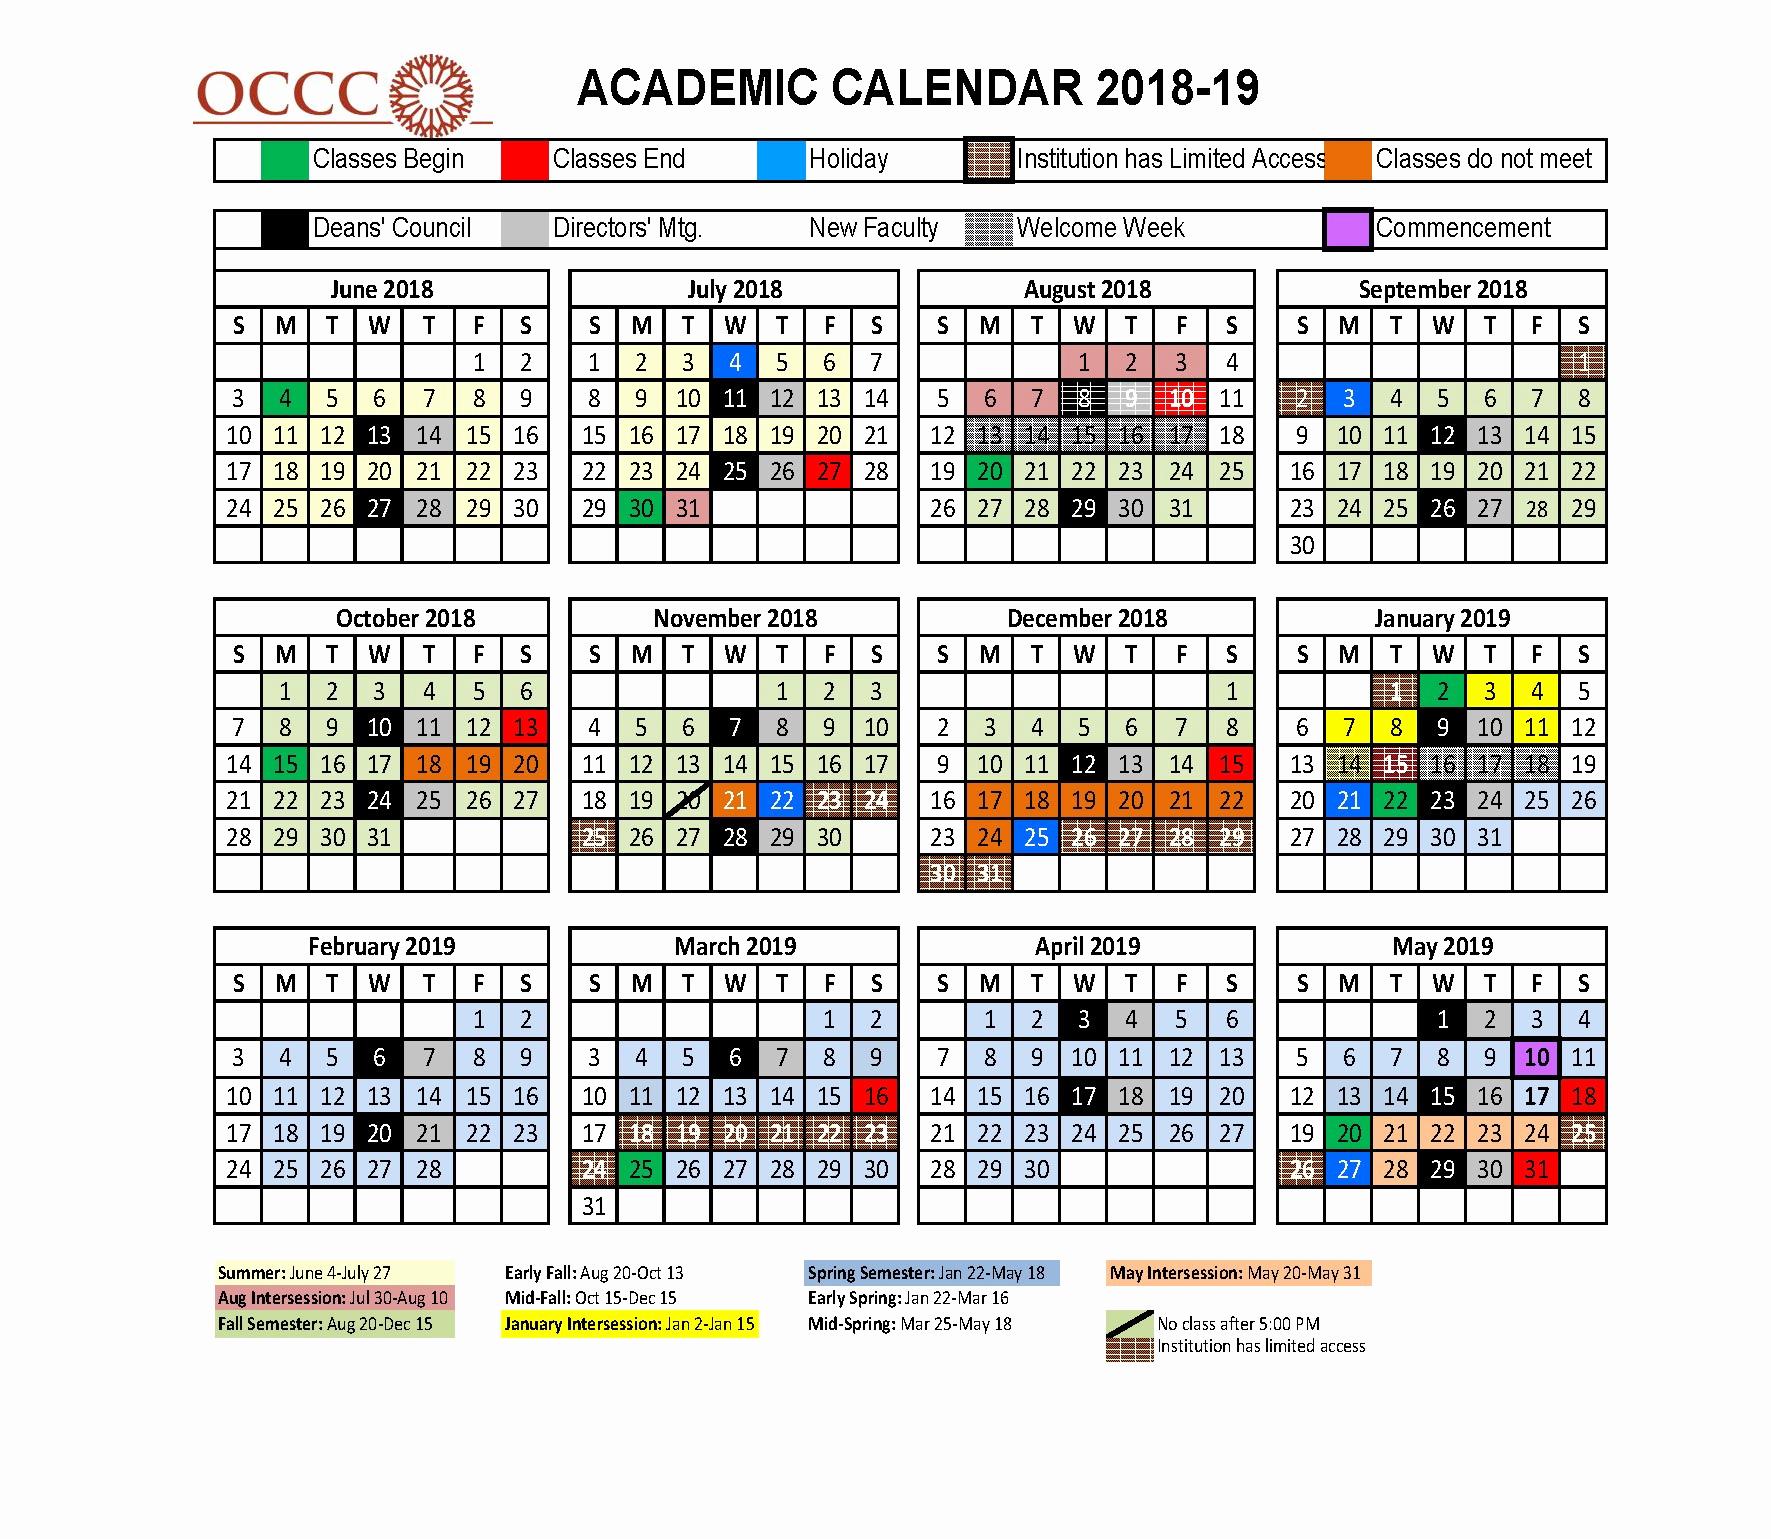 K State Calendar Spring 2020 | Calendar Printables Free Regarding Gsu Edu Academic Calendar